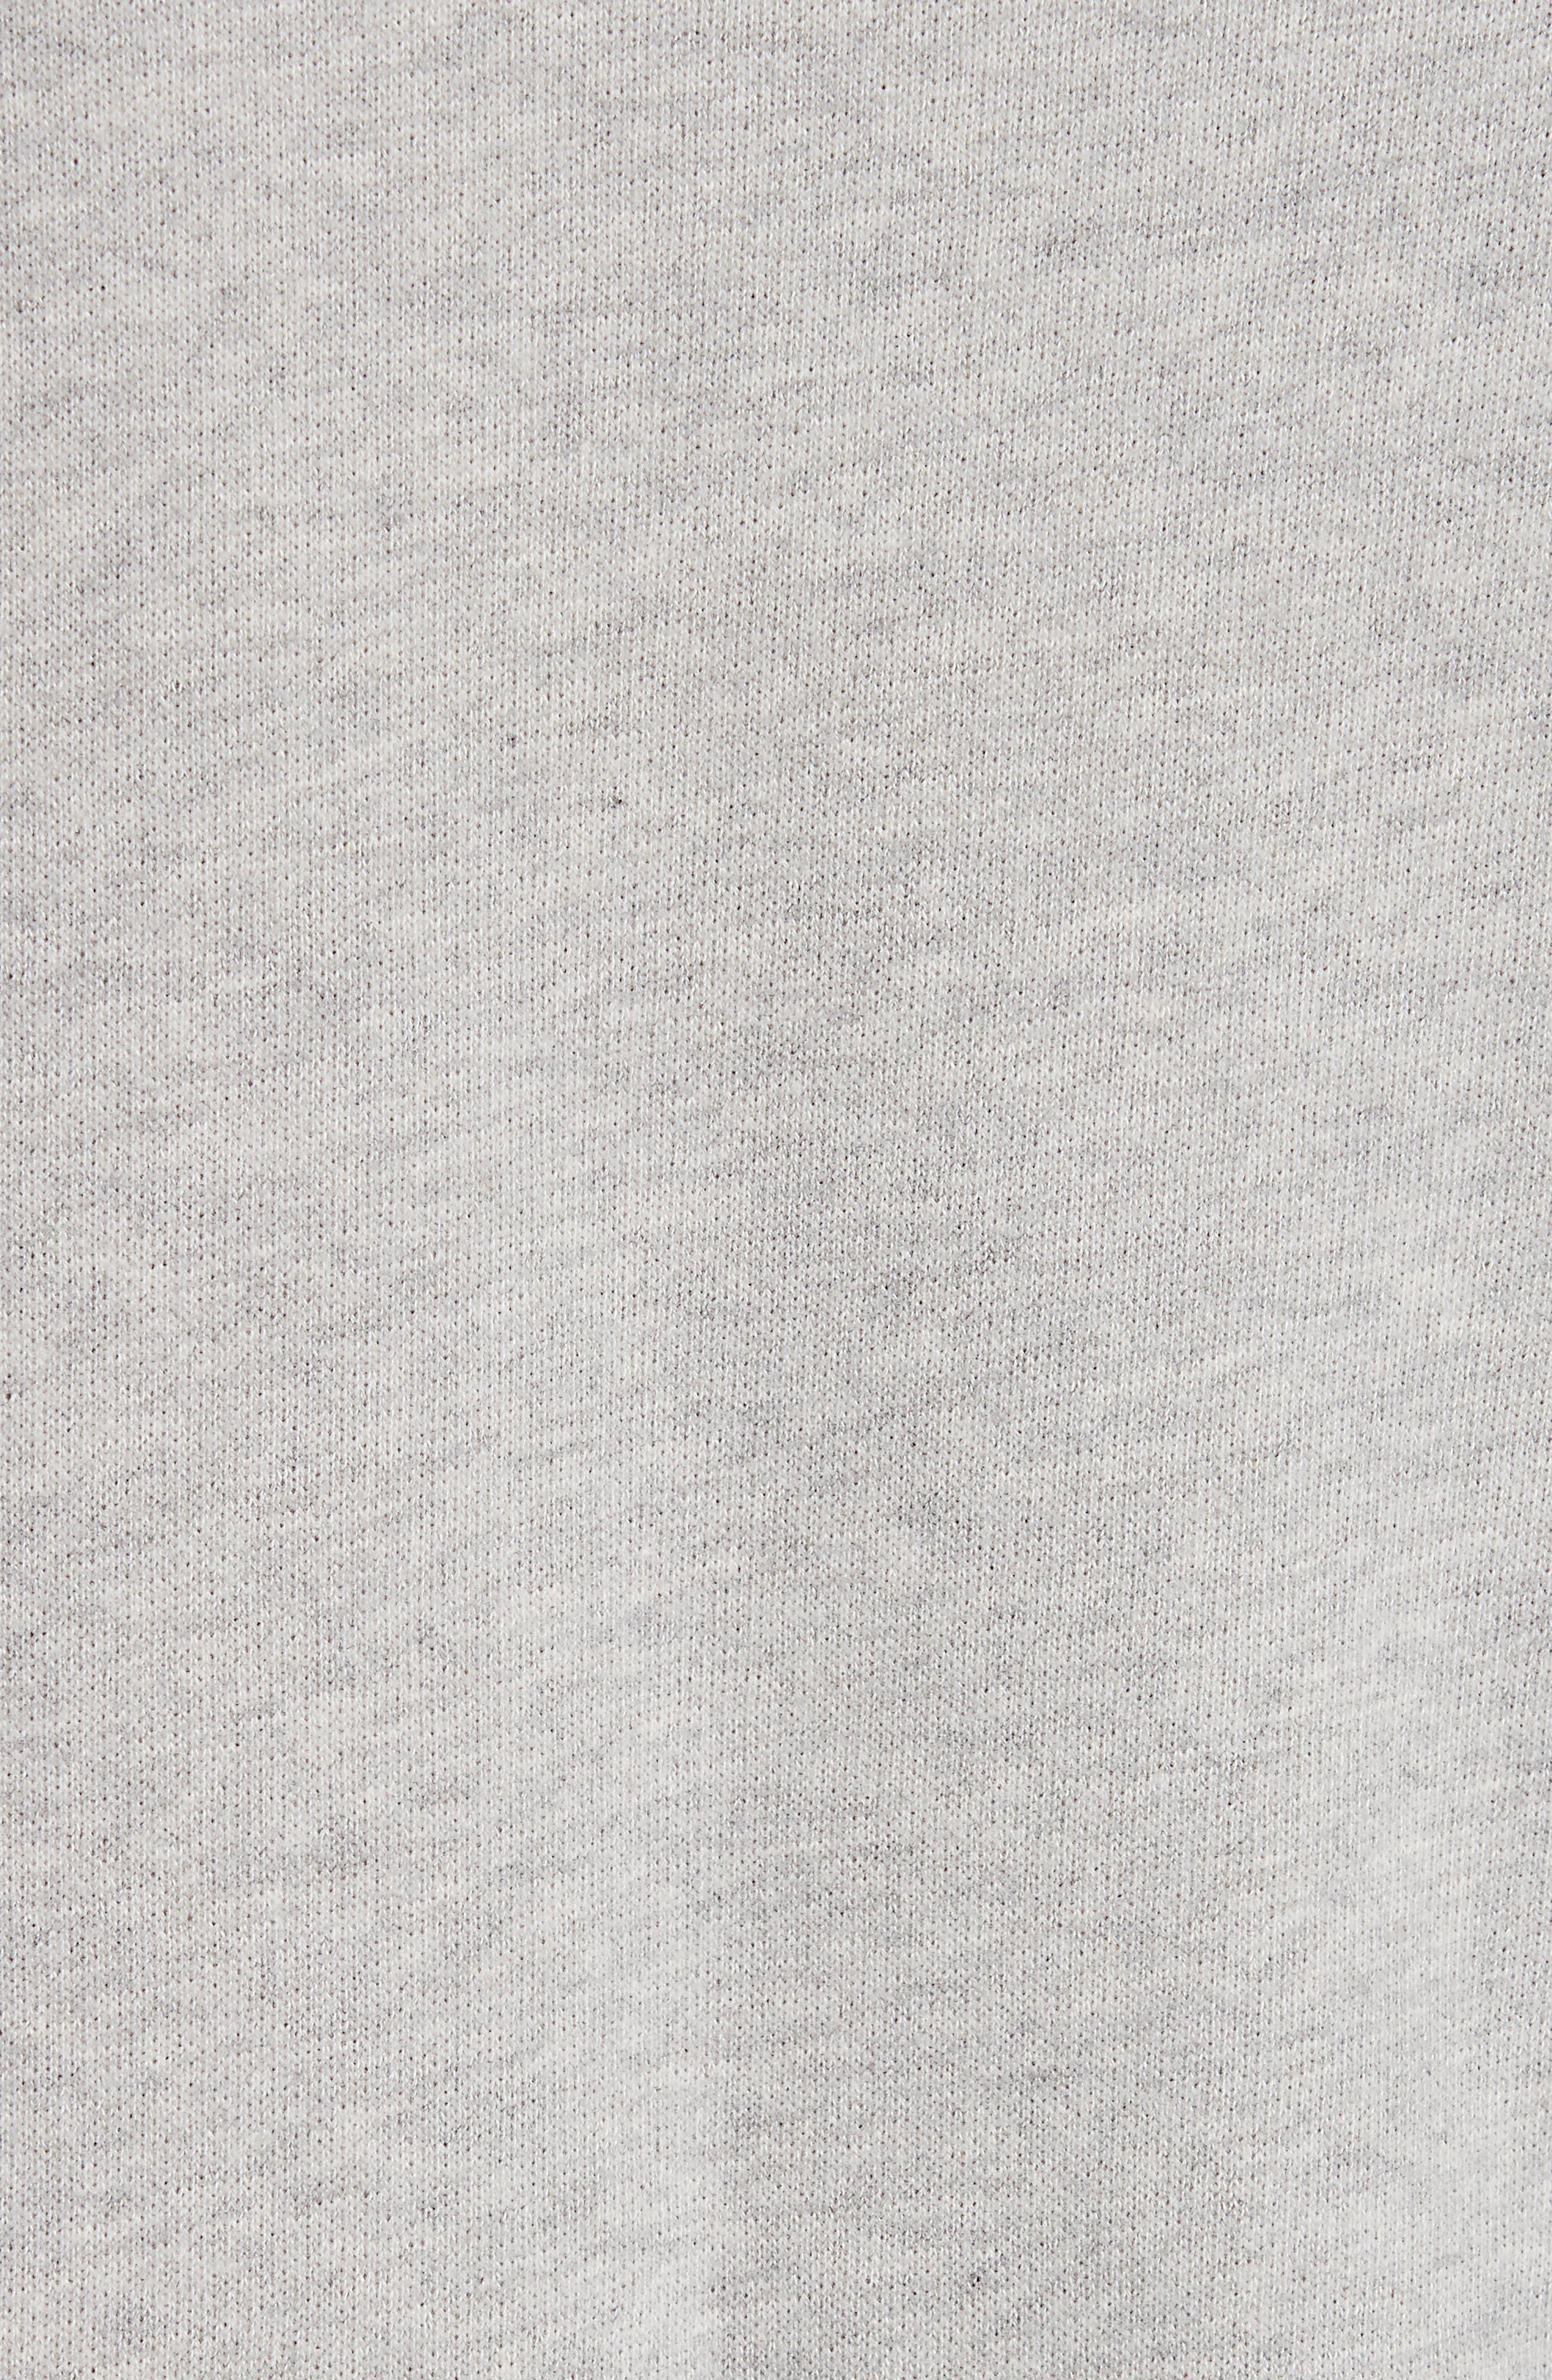 Cotton Sweatshirt,                             Alternate thumbnail 5, color,                             HEATHER GREY